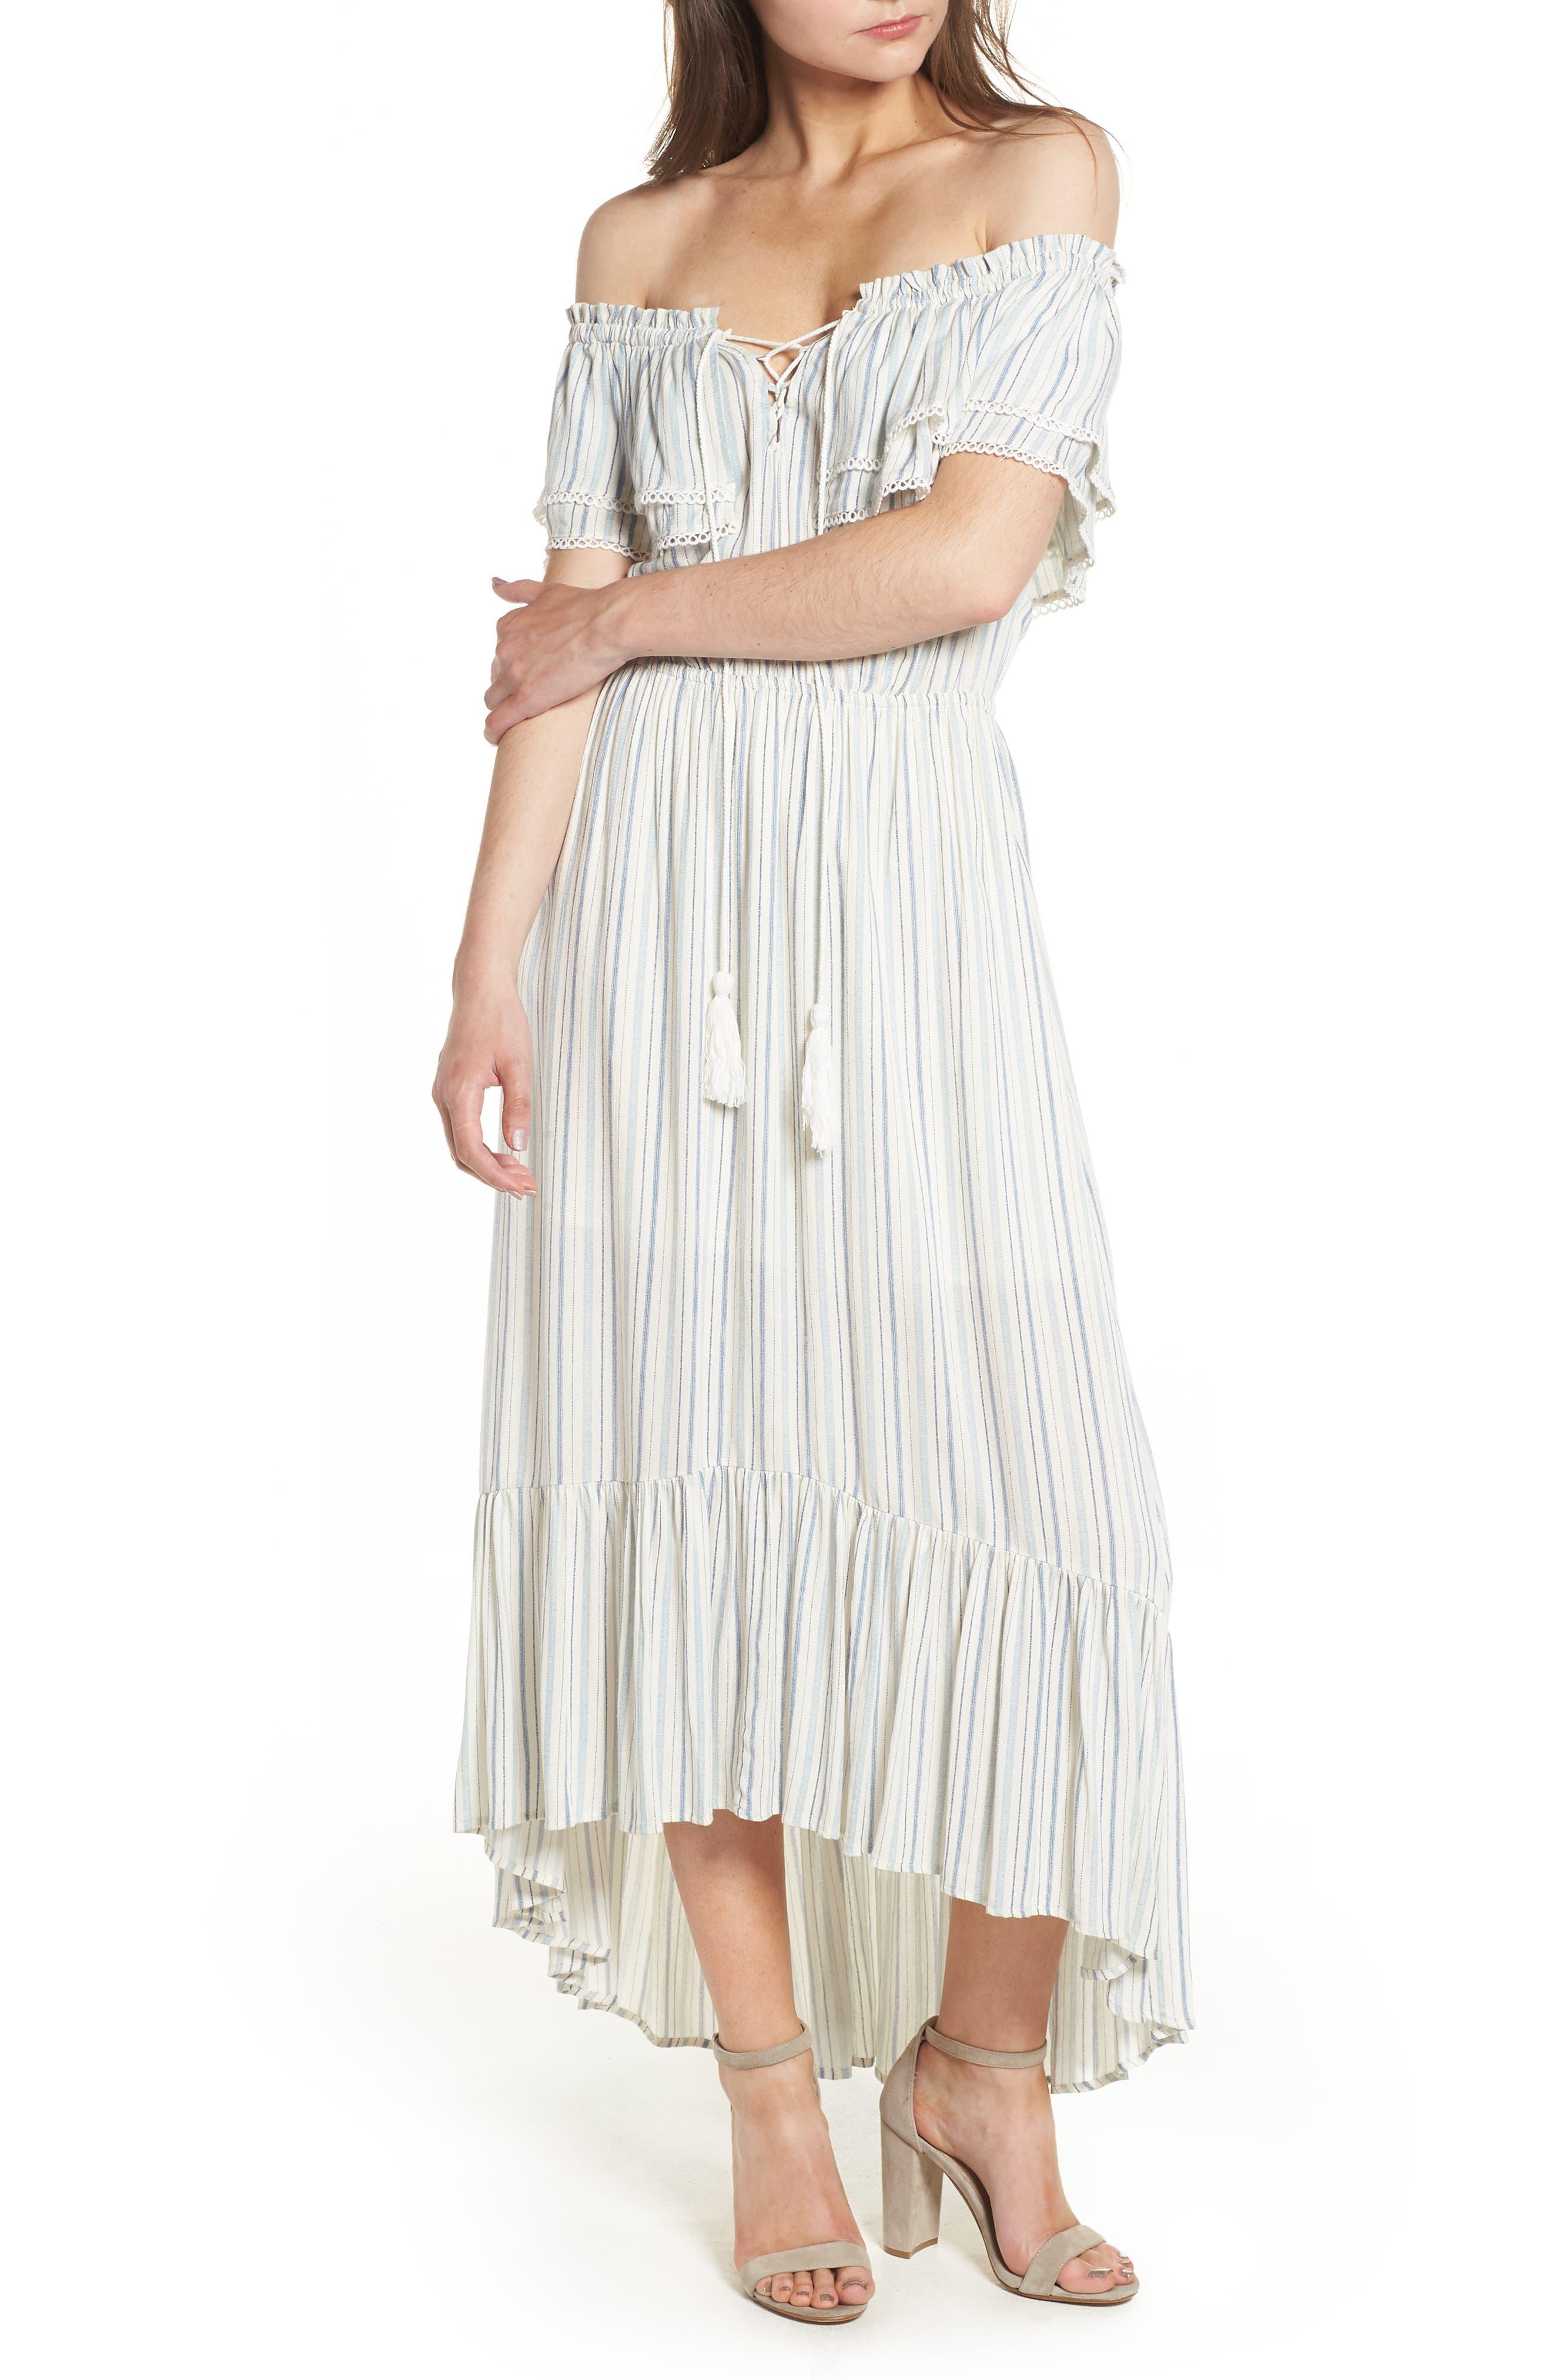 Kiara Off the Shoulder Maxi Dress,                         Main,                         color, Light Blue